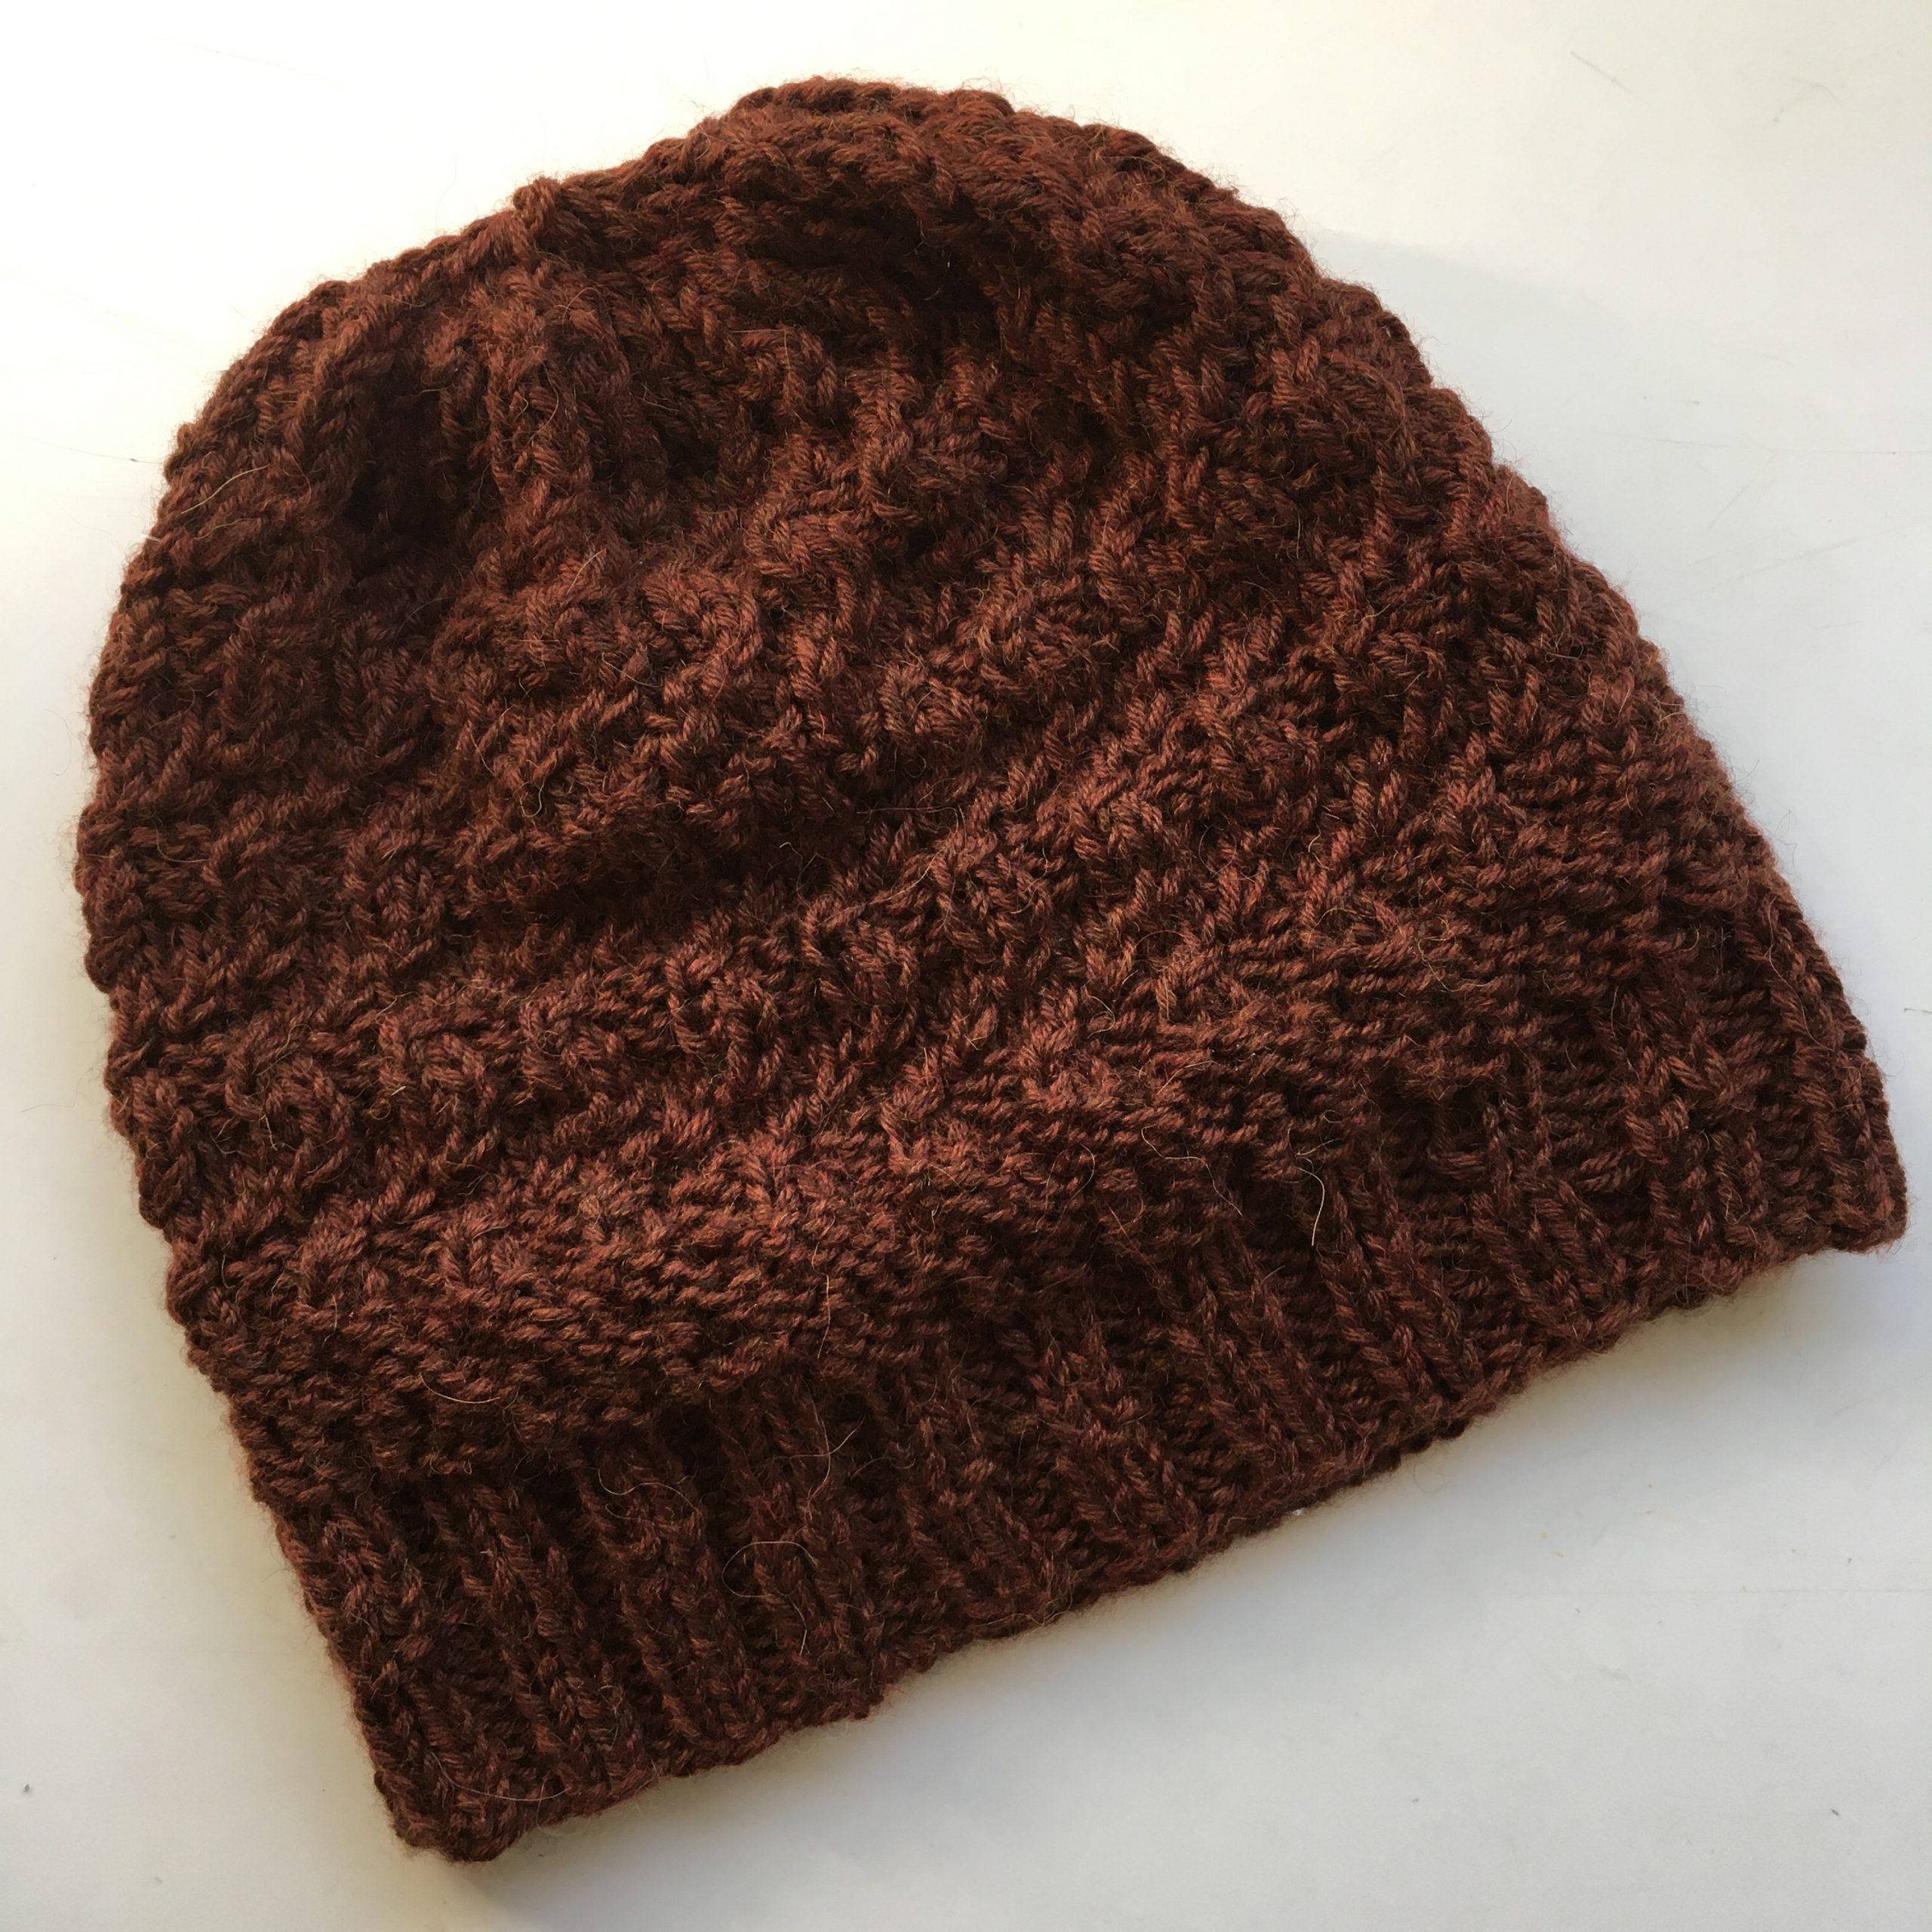 Winter Hat - Decumani pattern by Renate Kamm